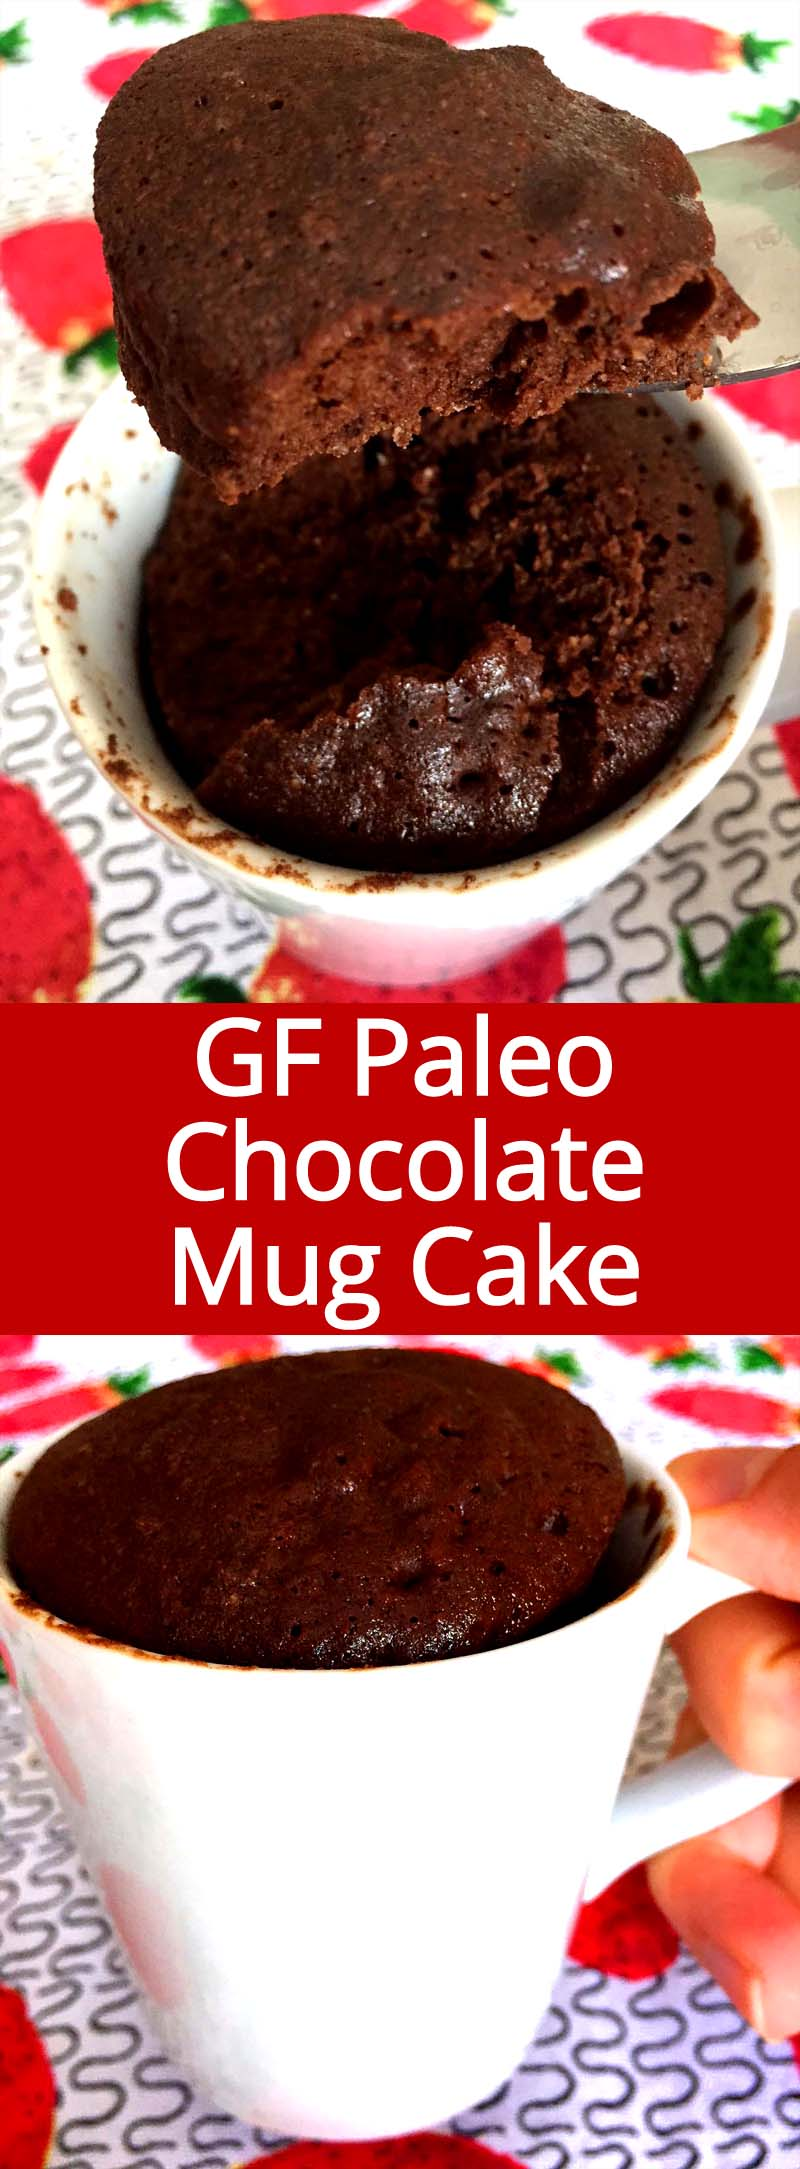 Healthy Chocolate Mug Cake Recipe (Gluten-Free, Paleo ...